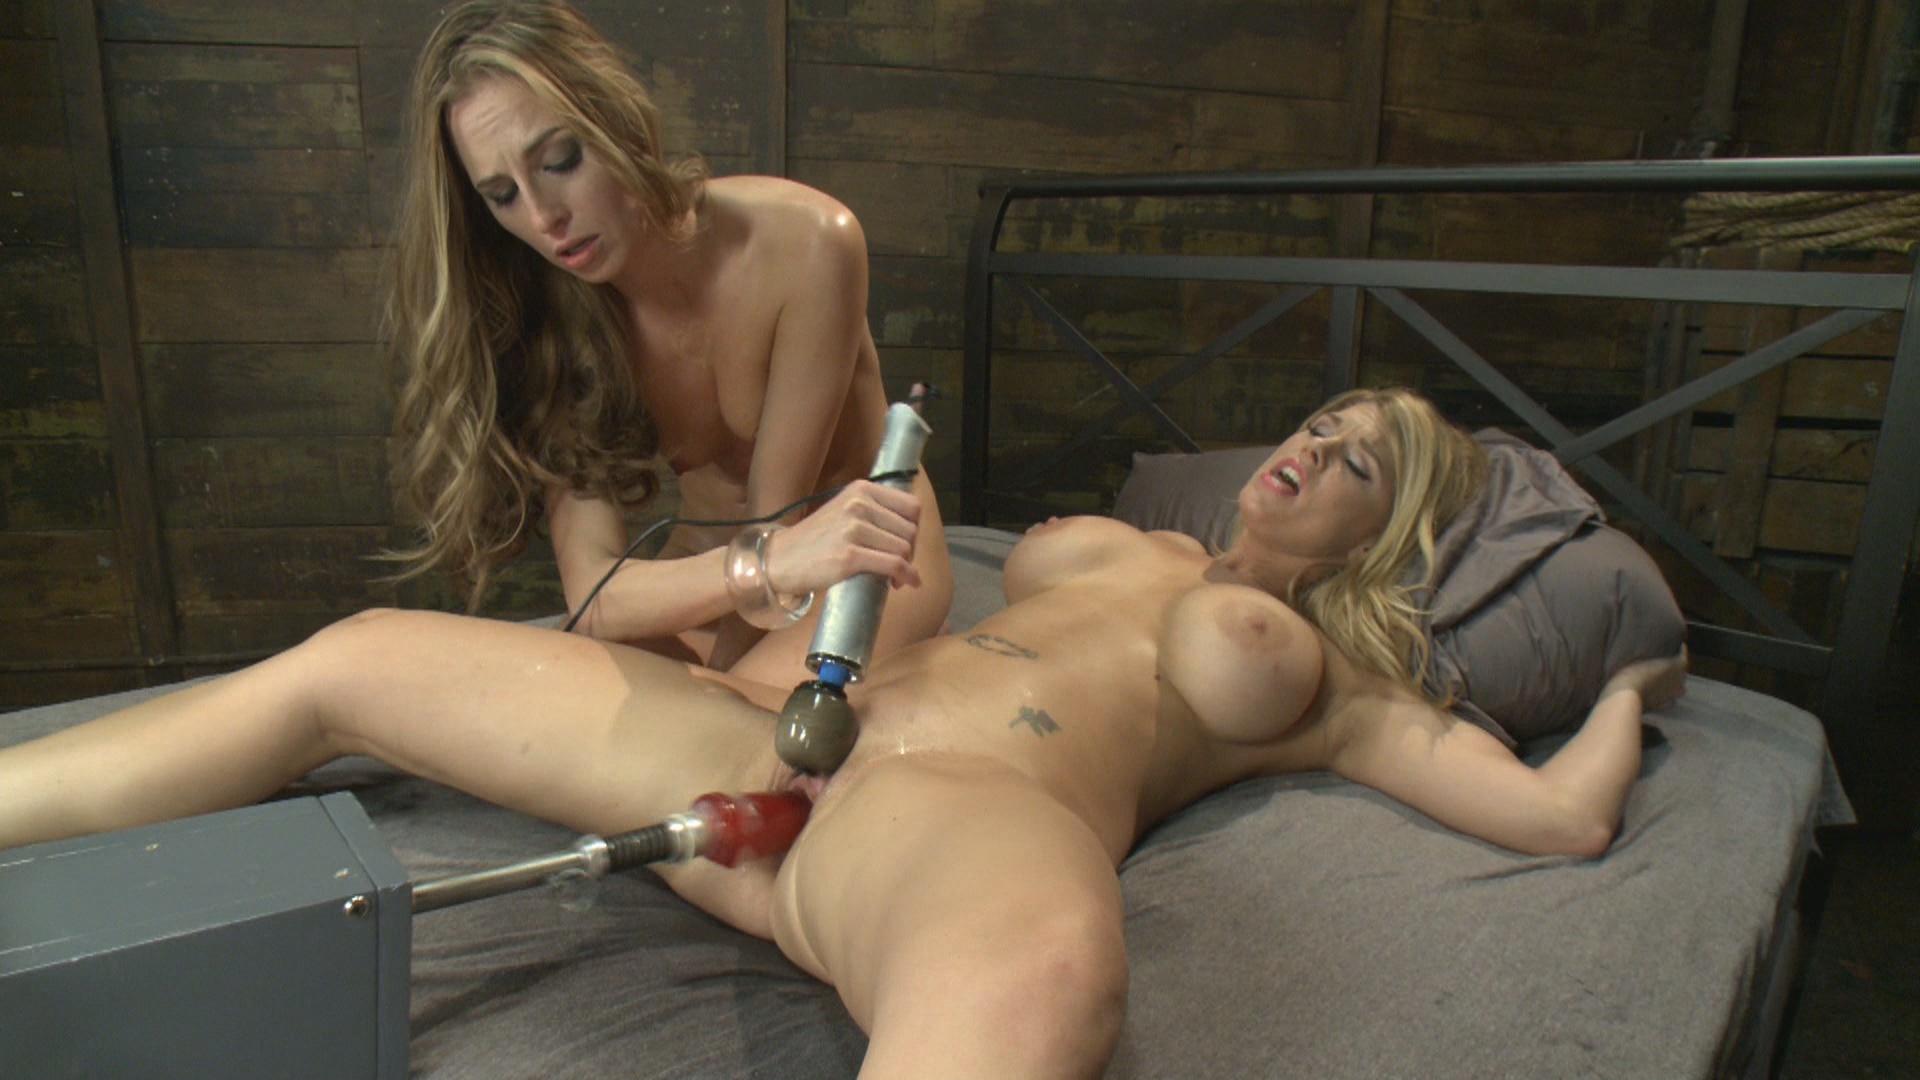 women using dildos